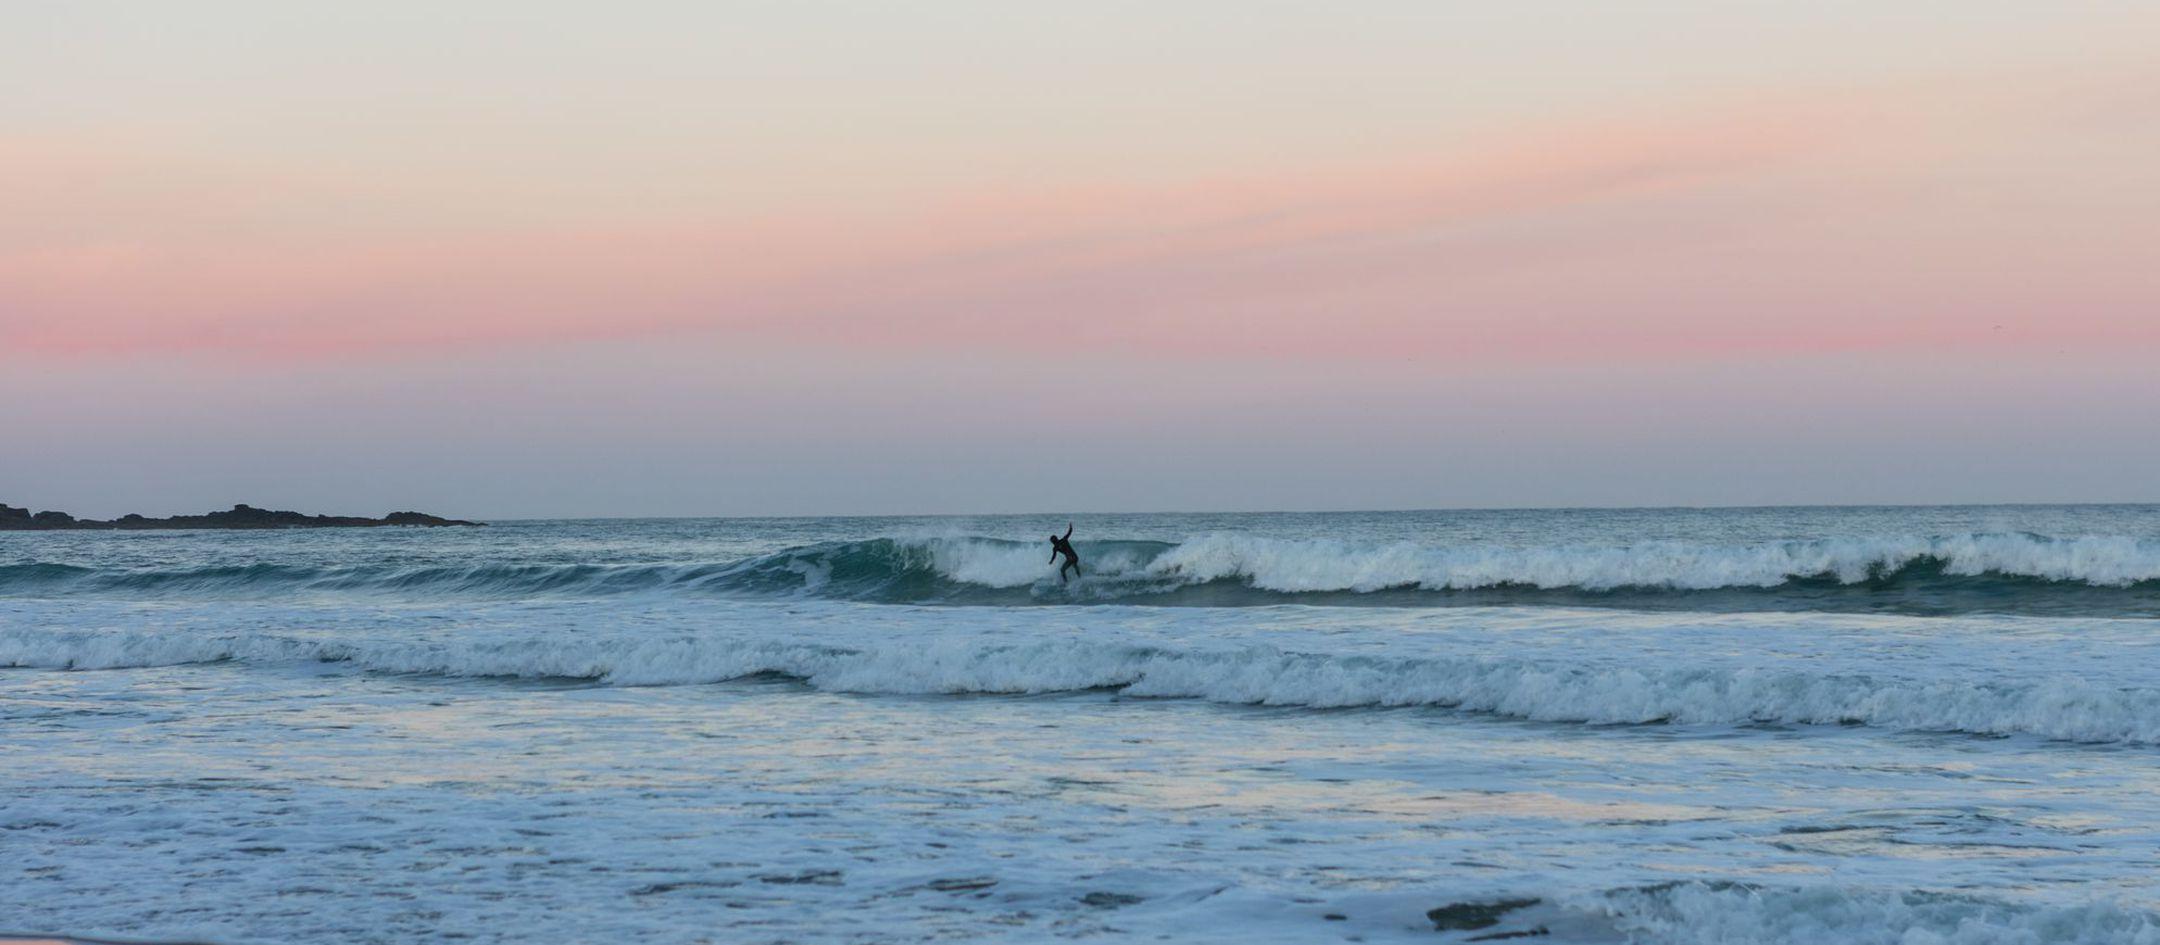 Best beaches in Cornwall - Beachspoke self-catering apartment